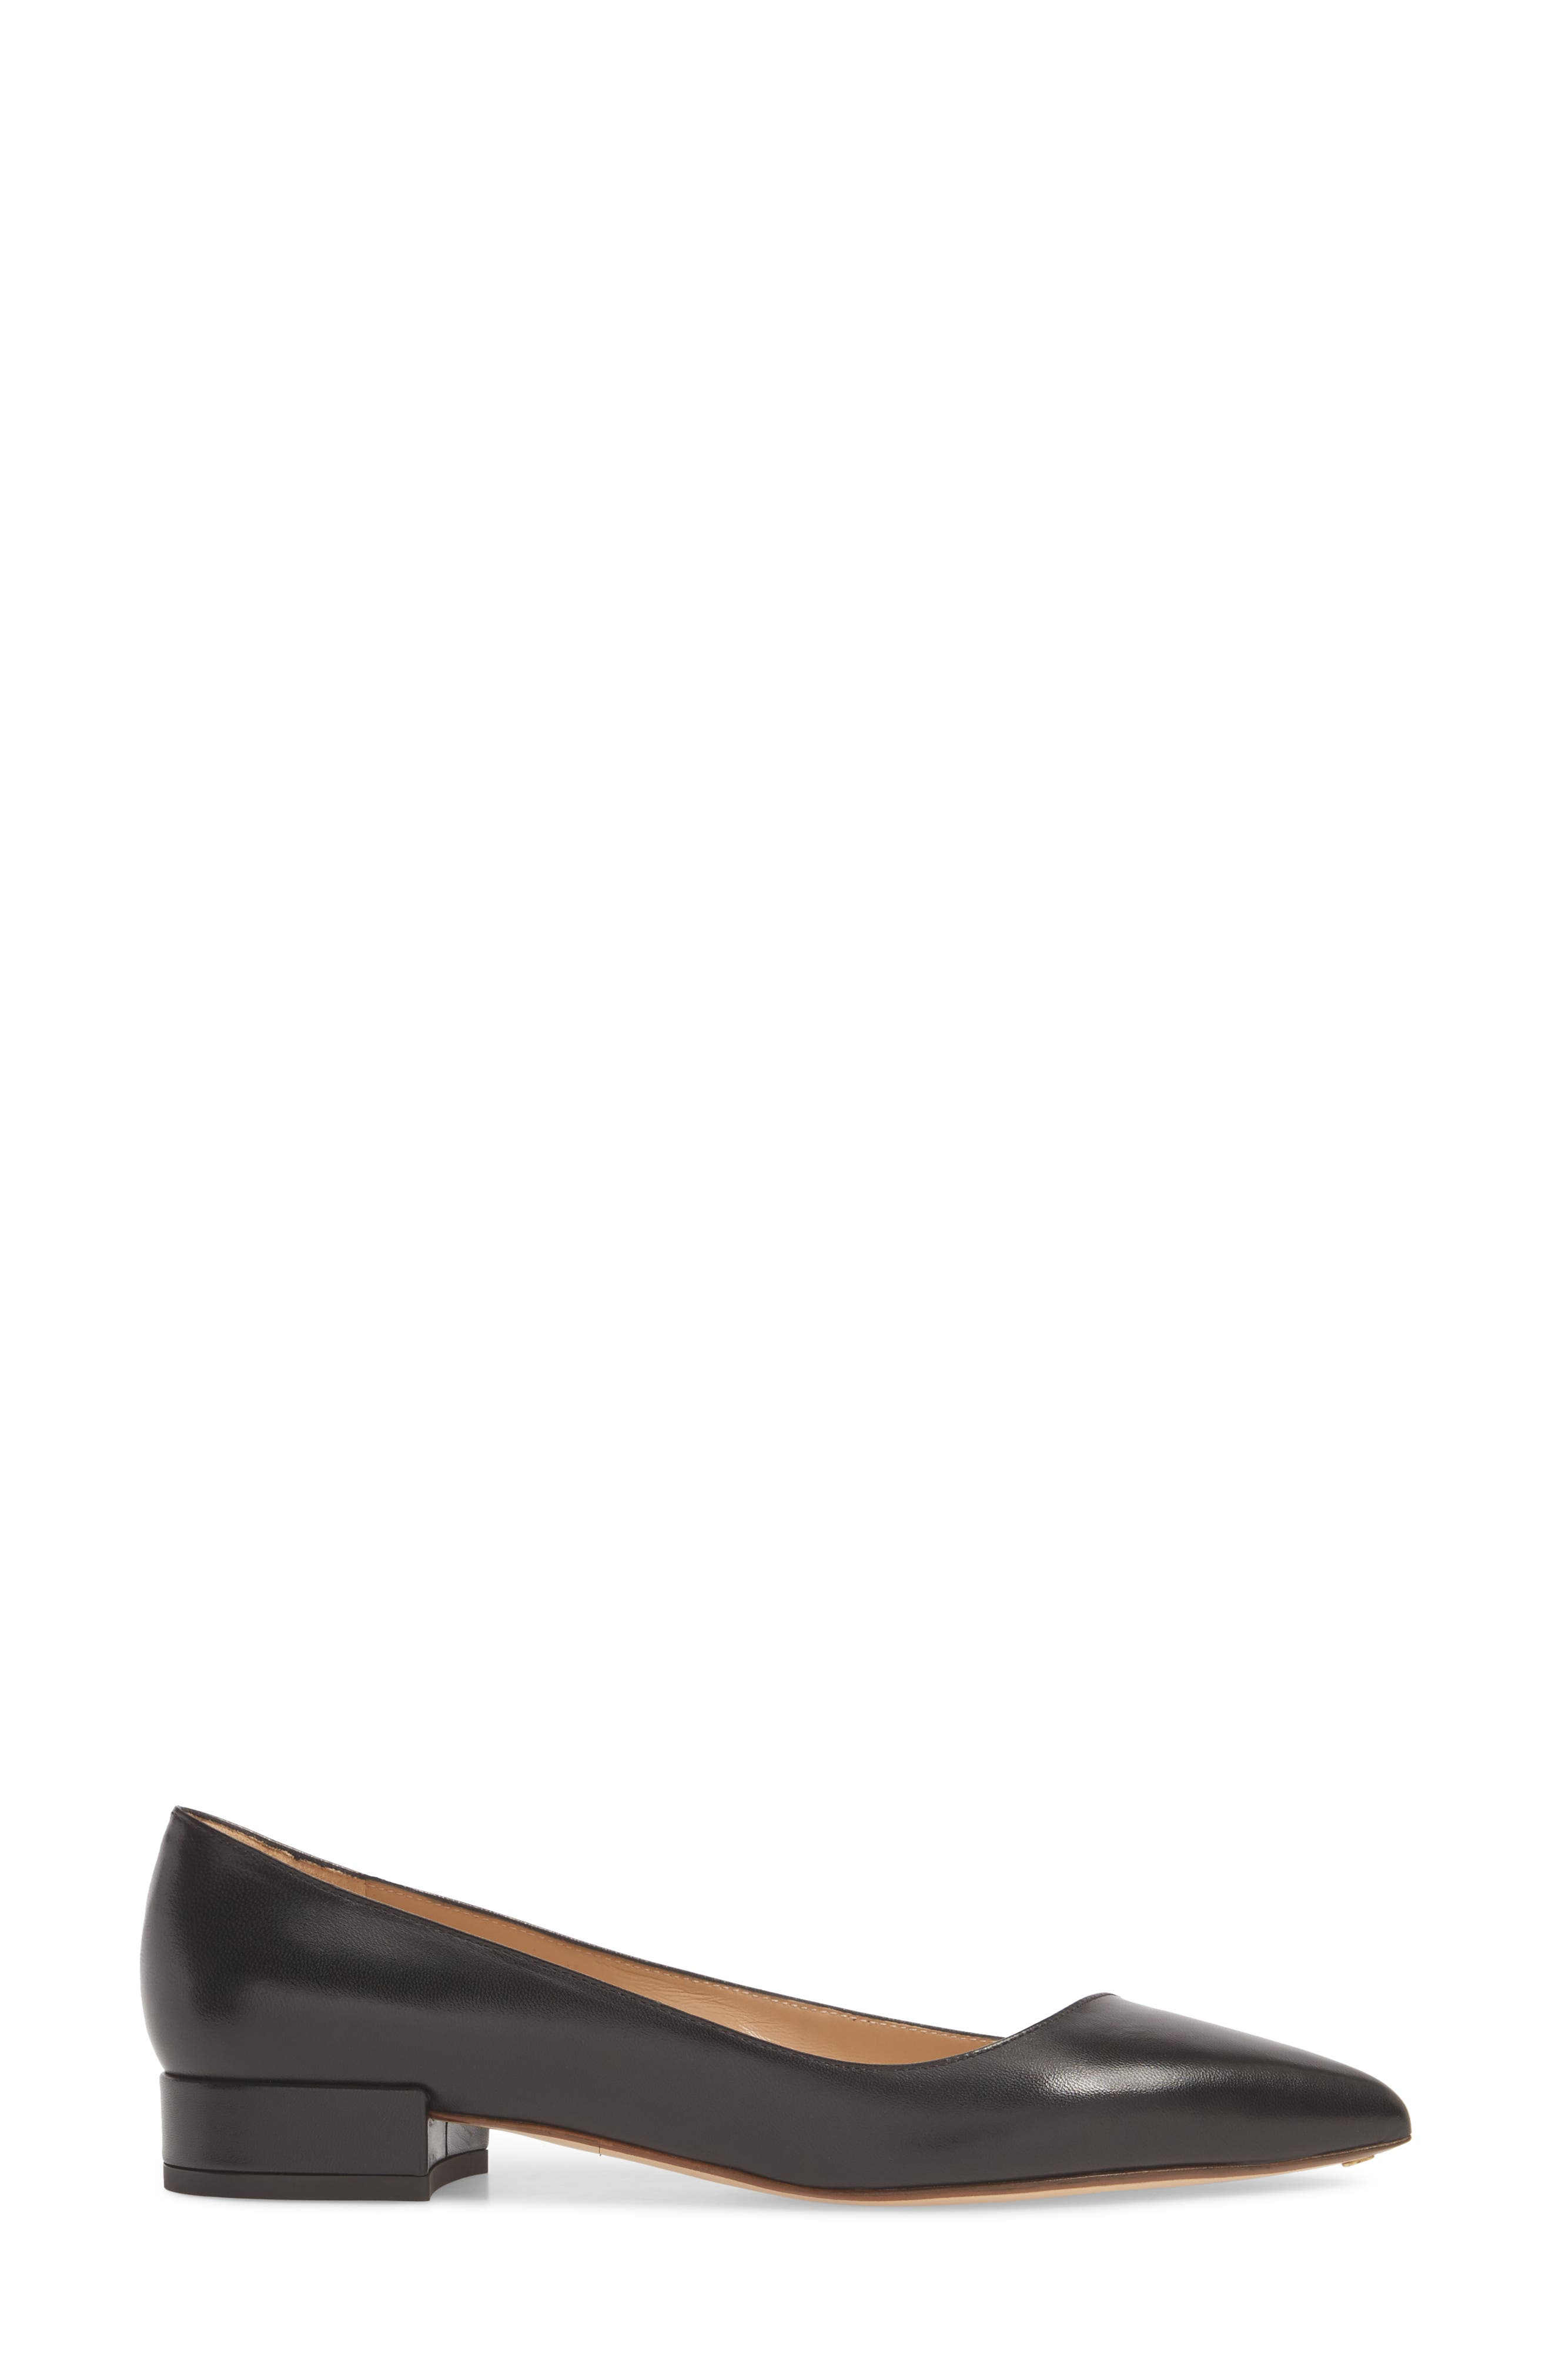 FRANCESCO RUSSO, Asymmetric Pointy Toe Flat, Alternate thumbnail 3, color, BLACK